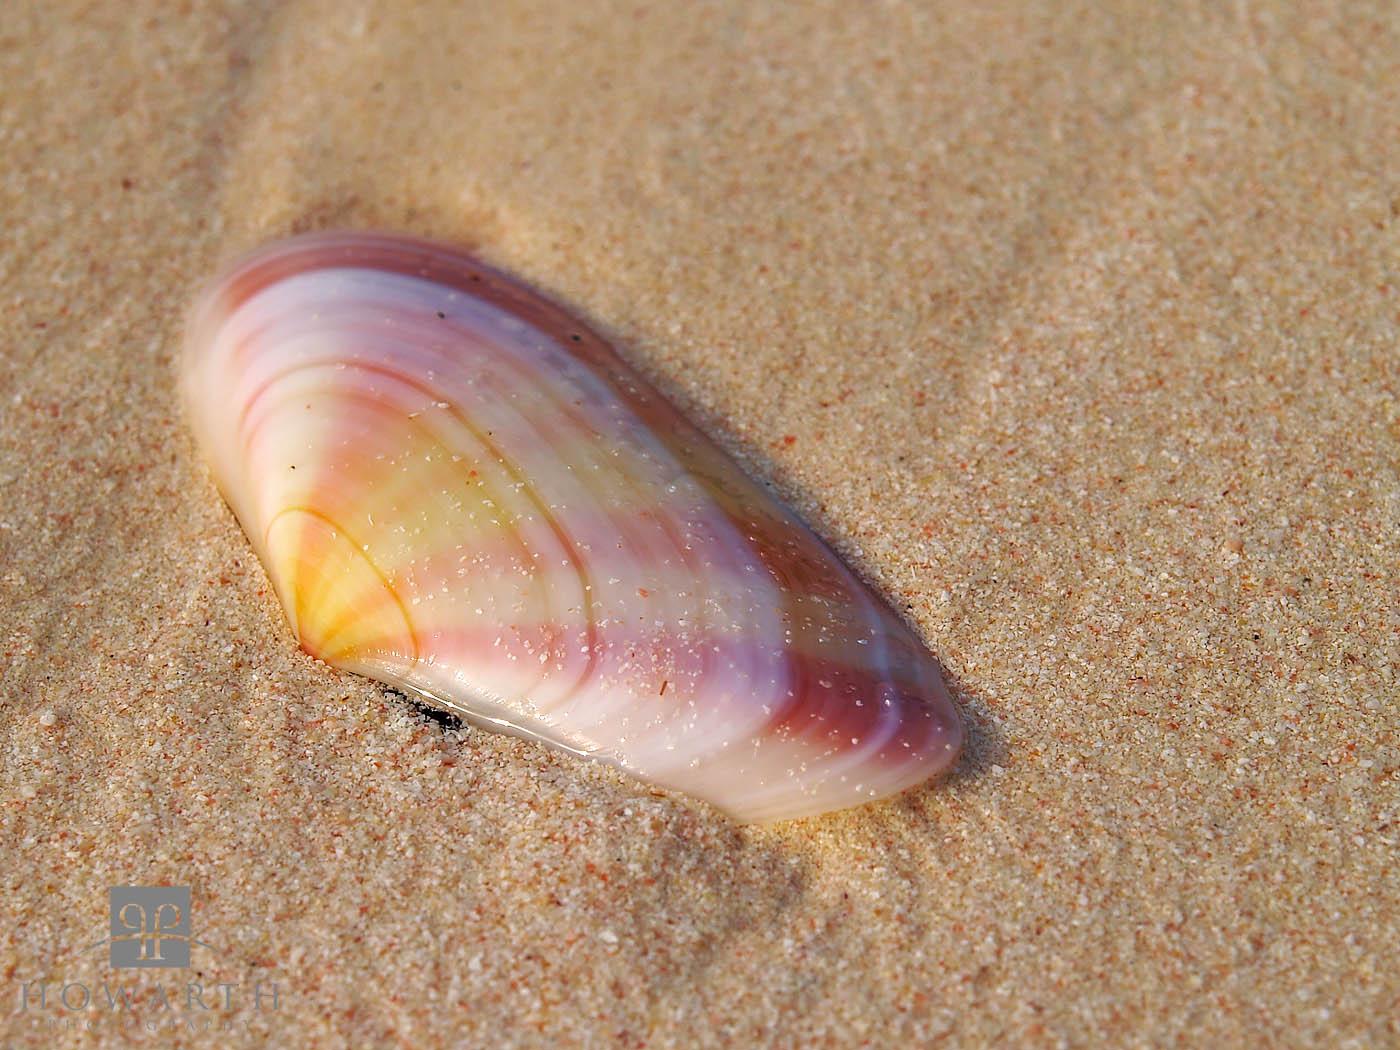 sunrise, tellin, sea, shell, pick, sand, beach, photo